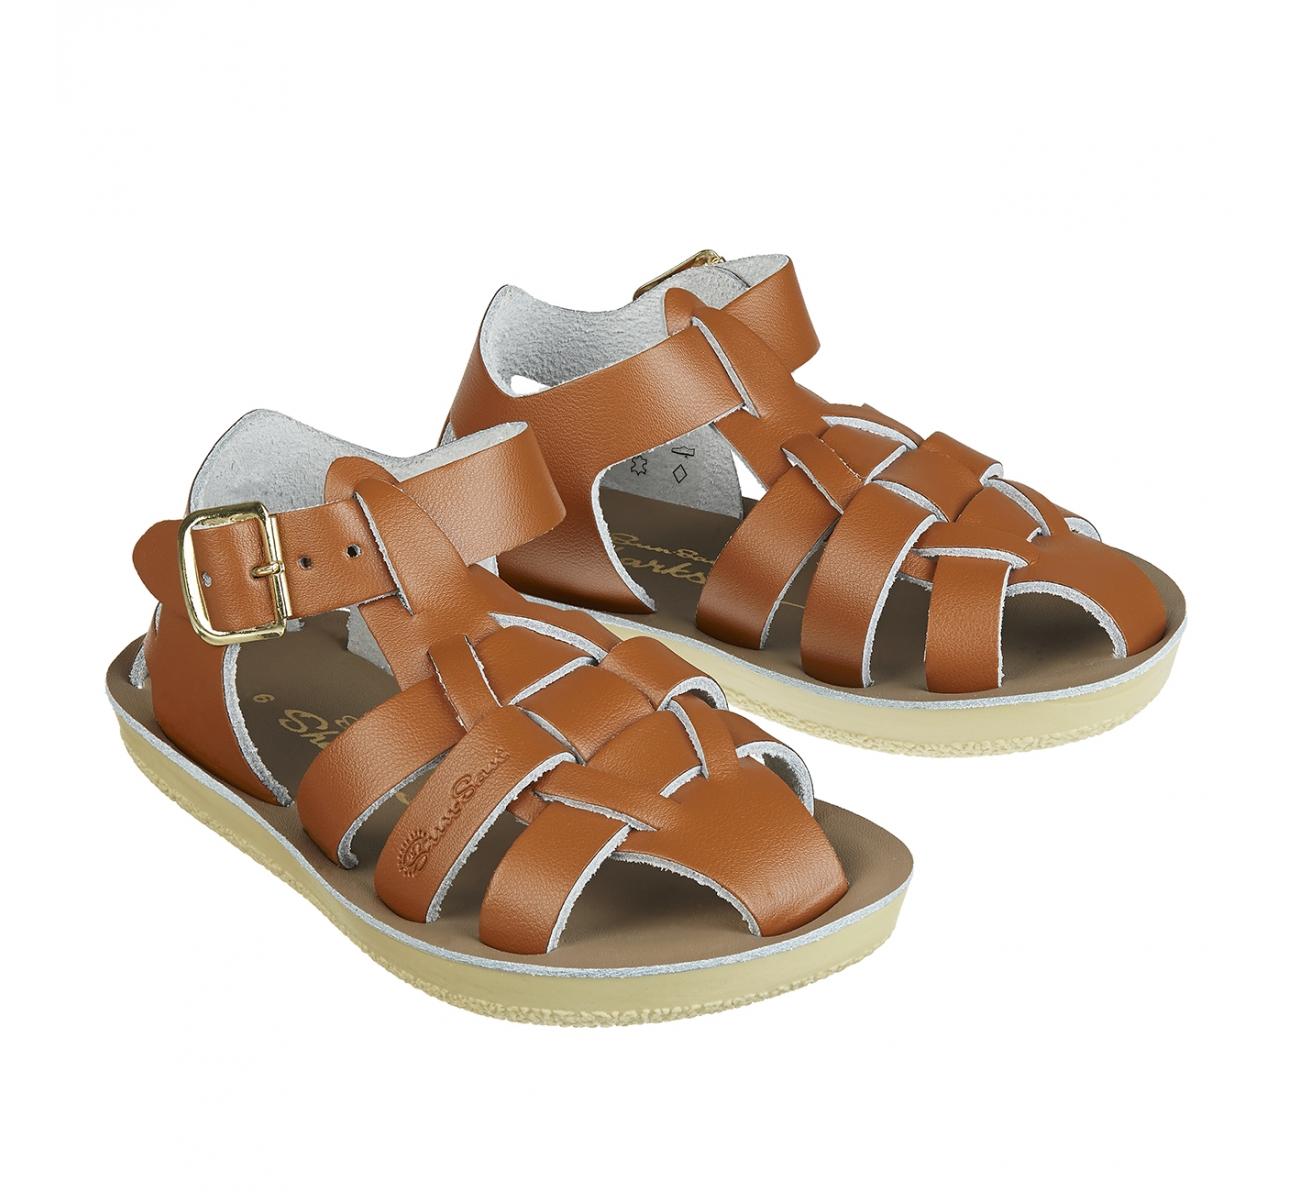 【Salt Water Sandals(ソルトウォーターサンダル)】Sun San Sharks(ベルクロ)/tan茶色/13.3cm~19.2cm